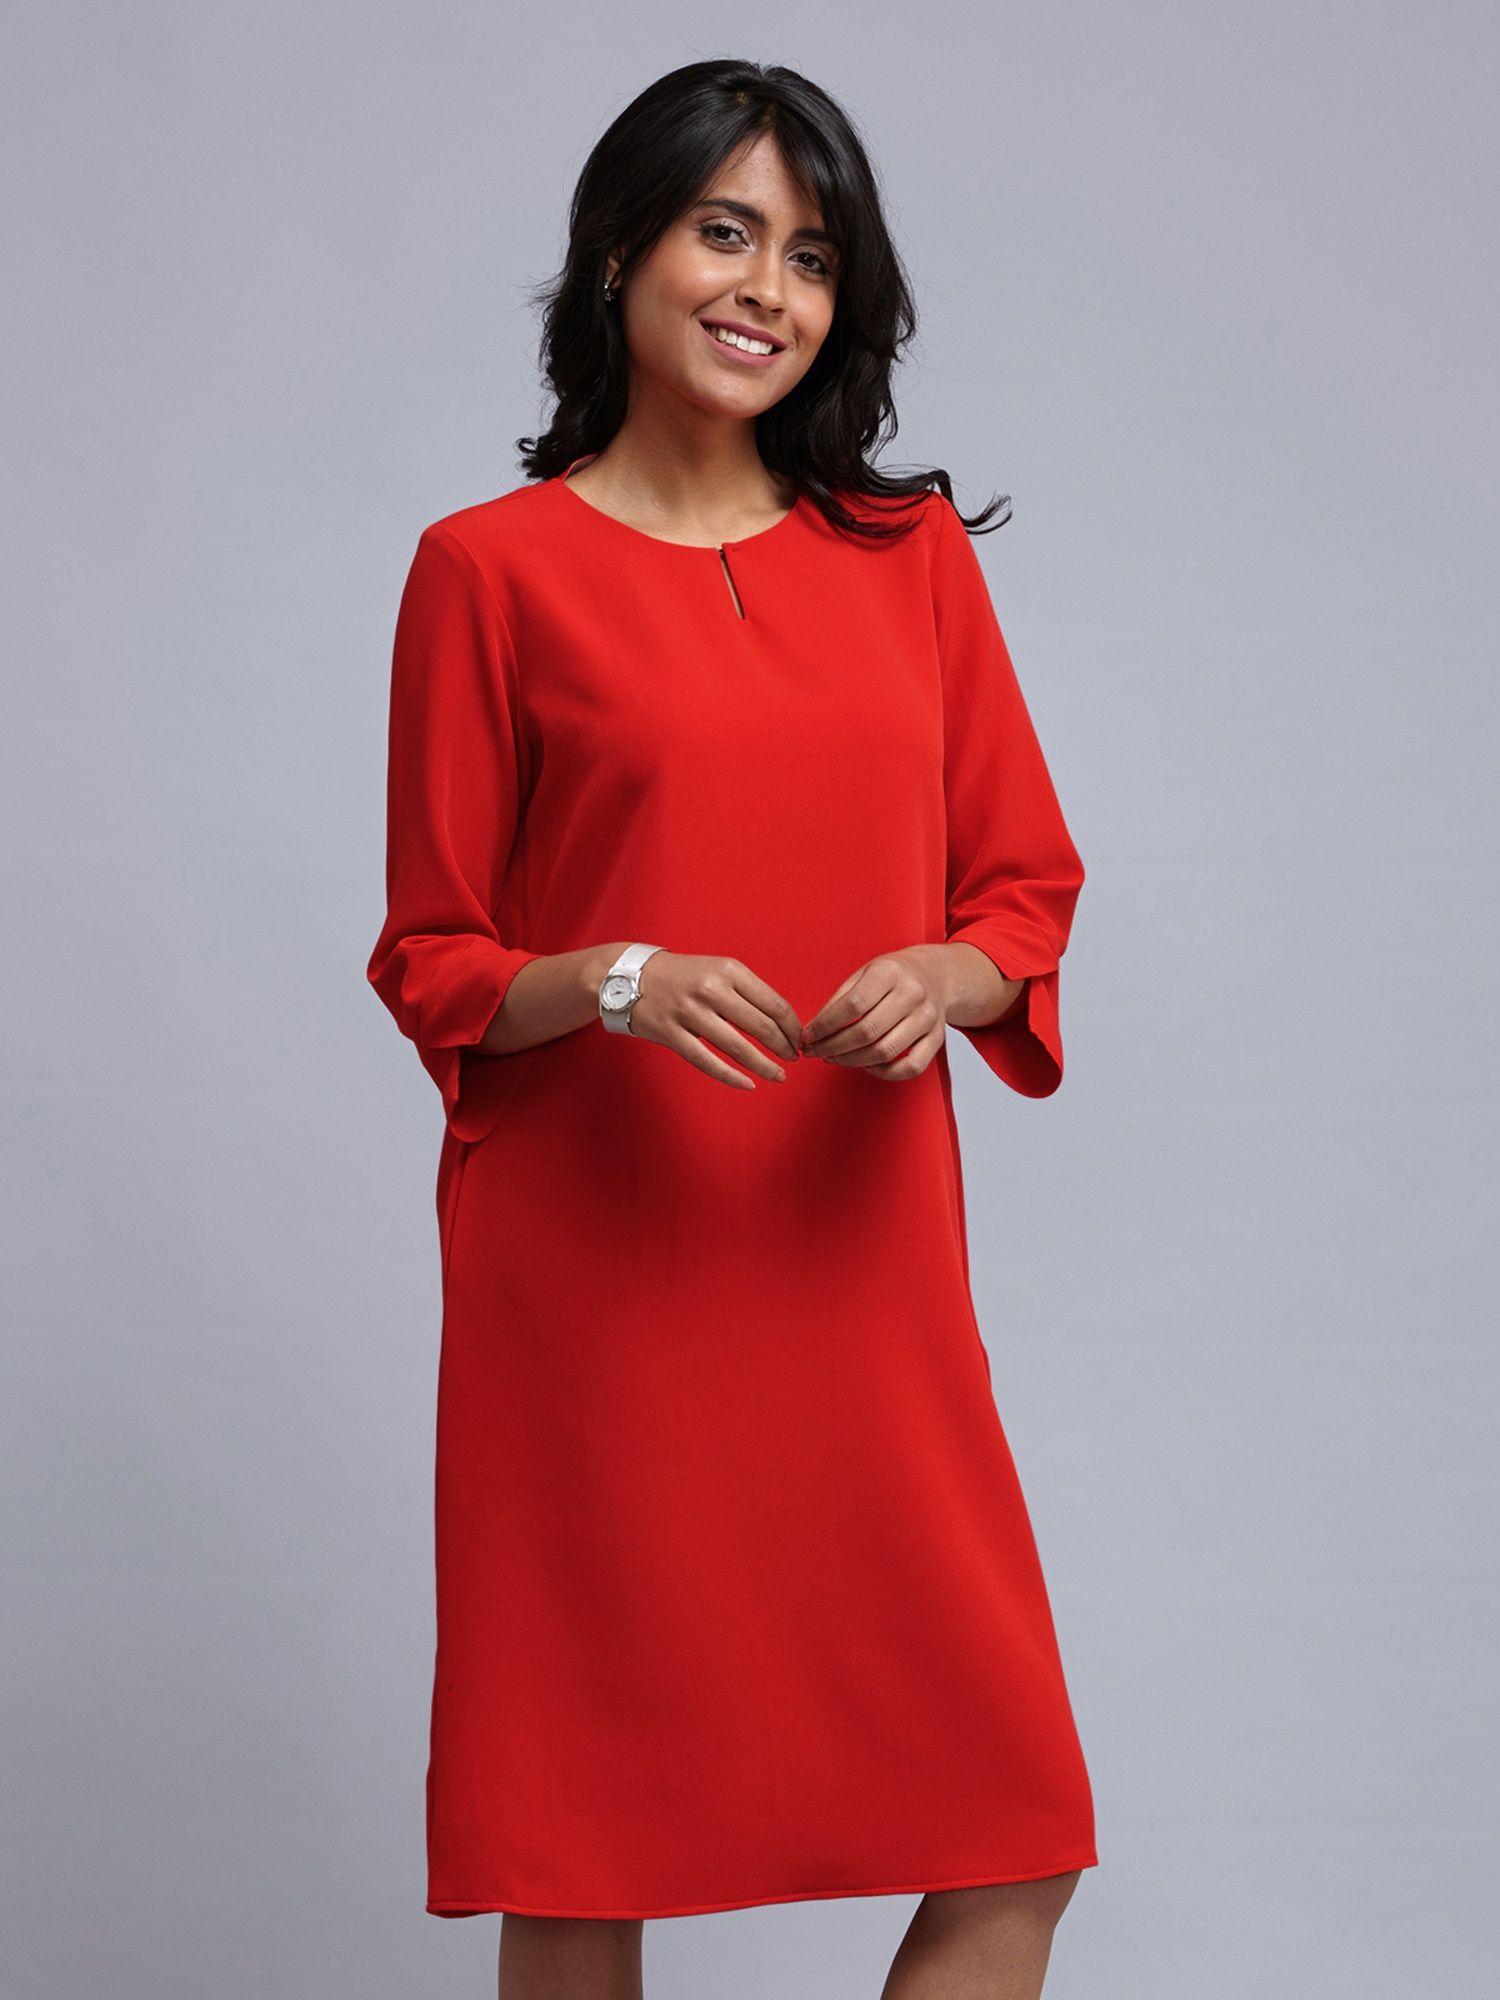 de703461b9 FableStreet Dresses   Buy FableStreet Front Keyhole Straight Fit ...